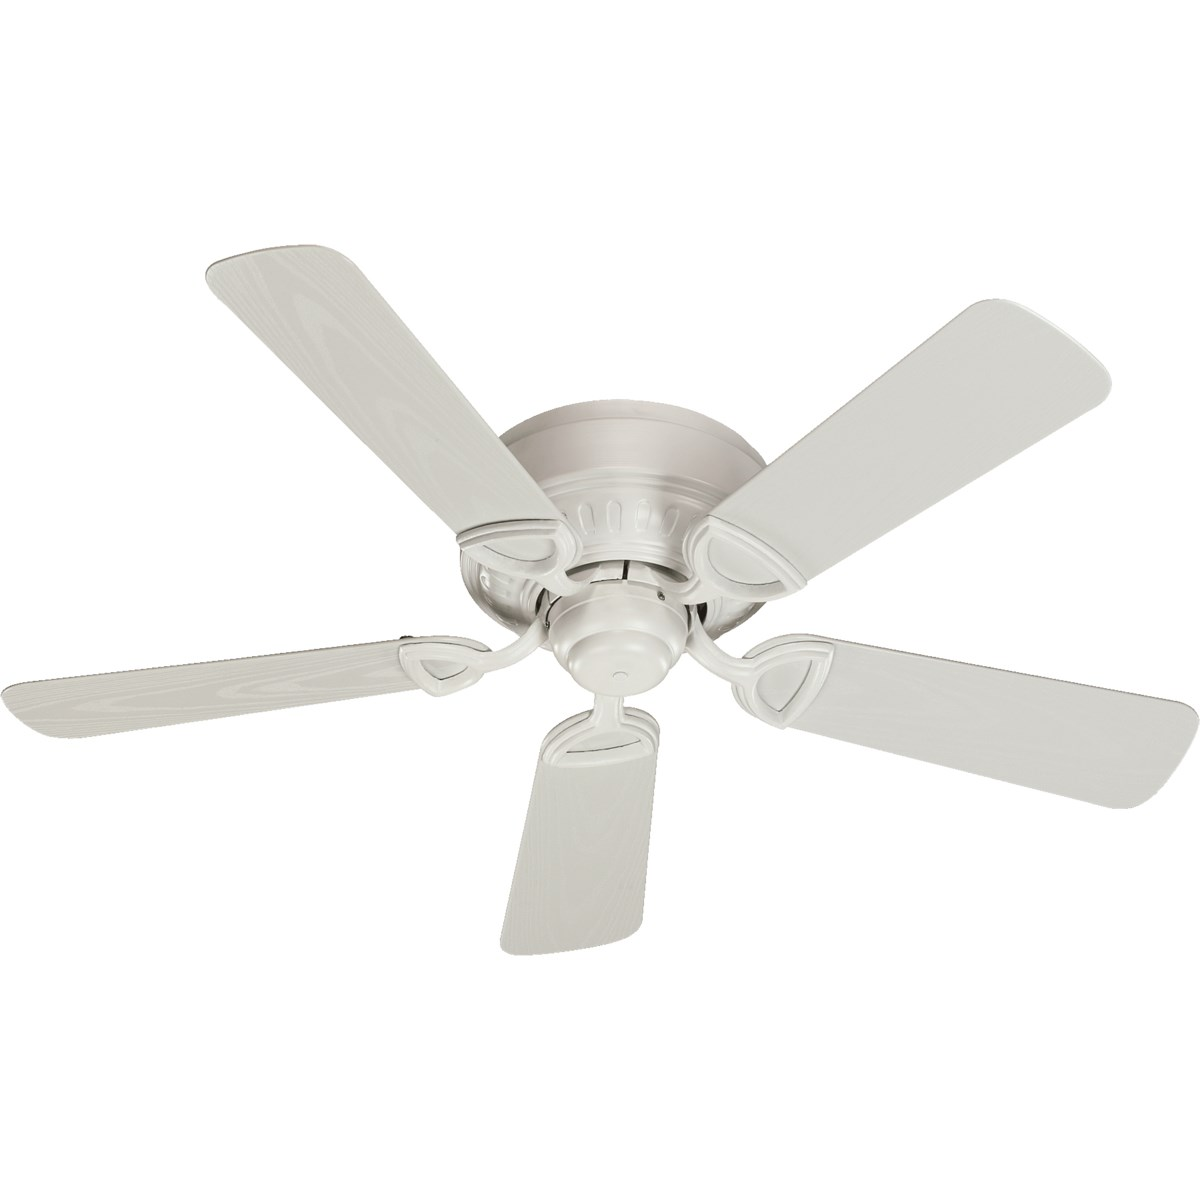 Medallion Patio 42-in Studio White Indoor/Outdoor Ceiling Fan (5-Blade)